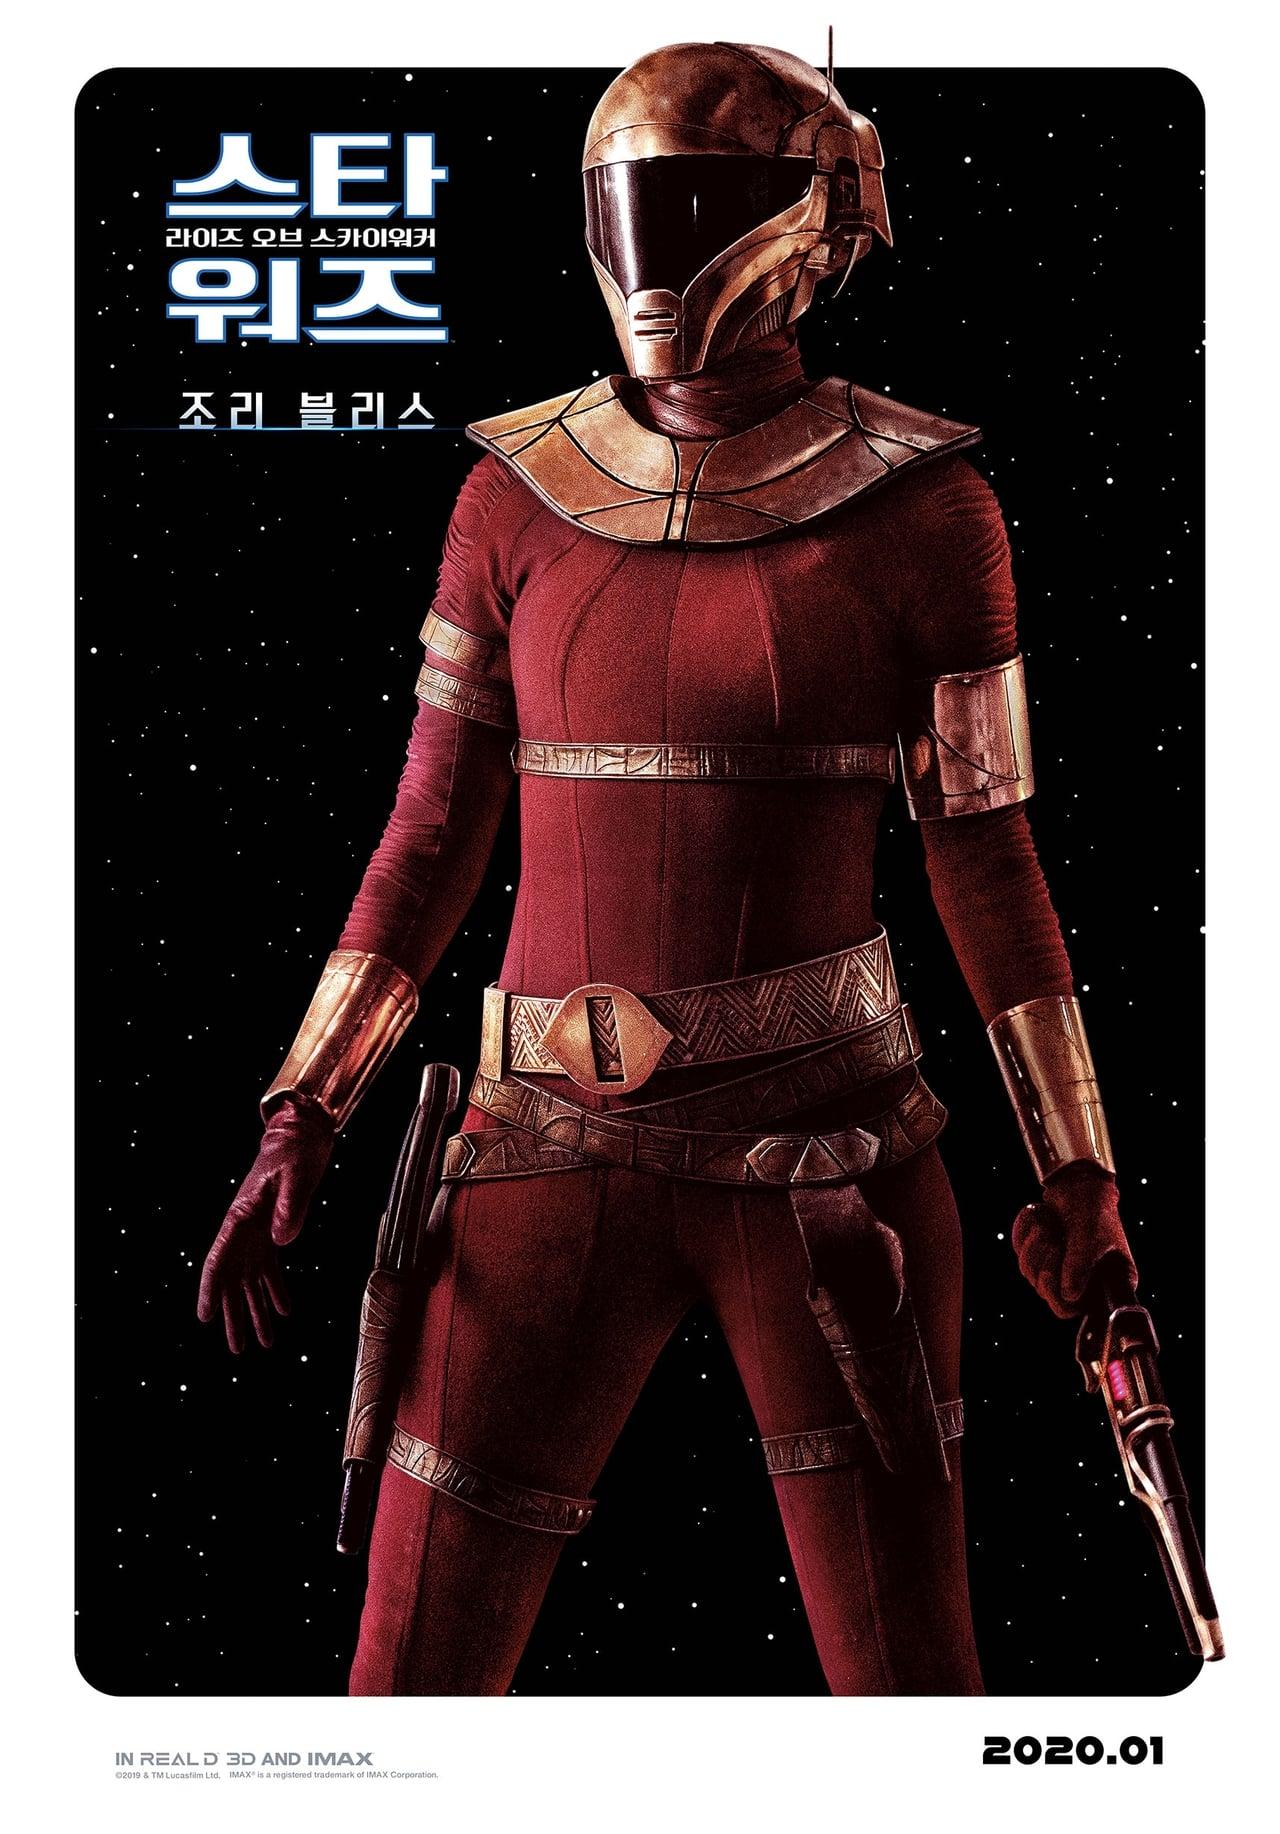 Movies Ultrahd 1080p Star Wars The Rise Of Skywalker 2019 Google Drive Torrent Star Wars Ix 2019 Google Docs Over Blog Com